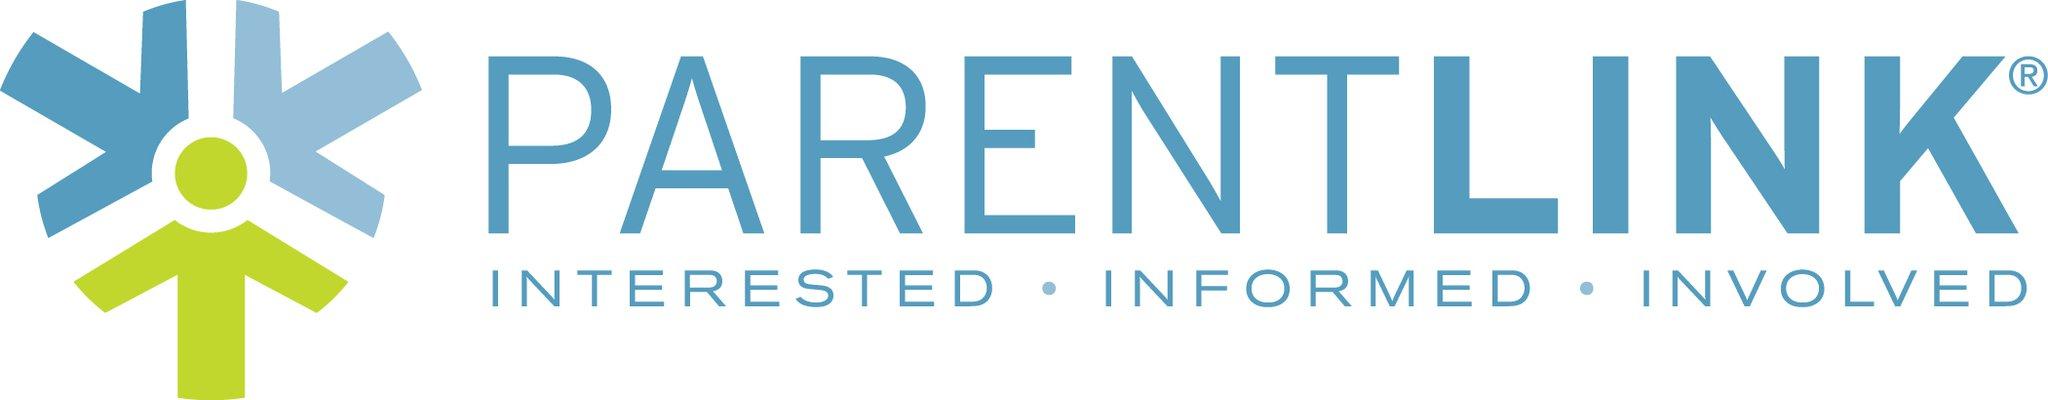 ParentLink Logo.jpg